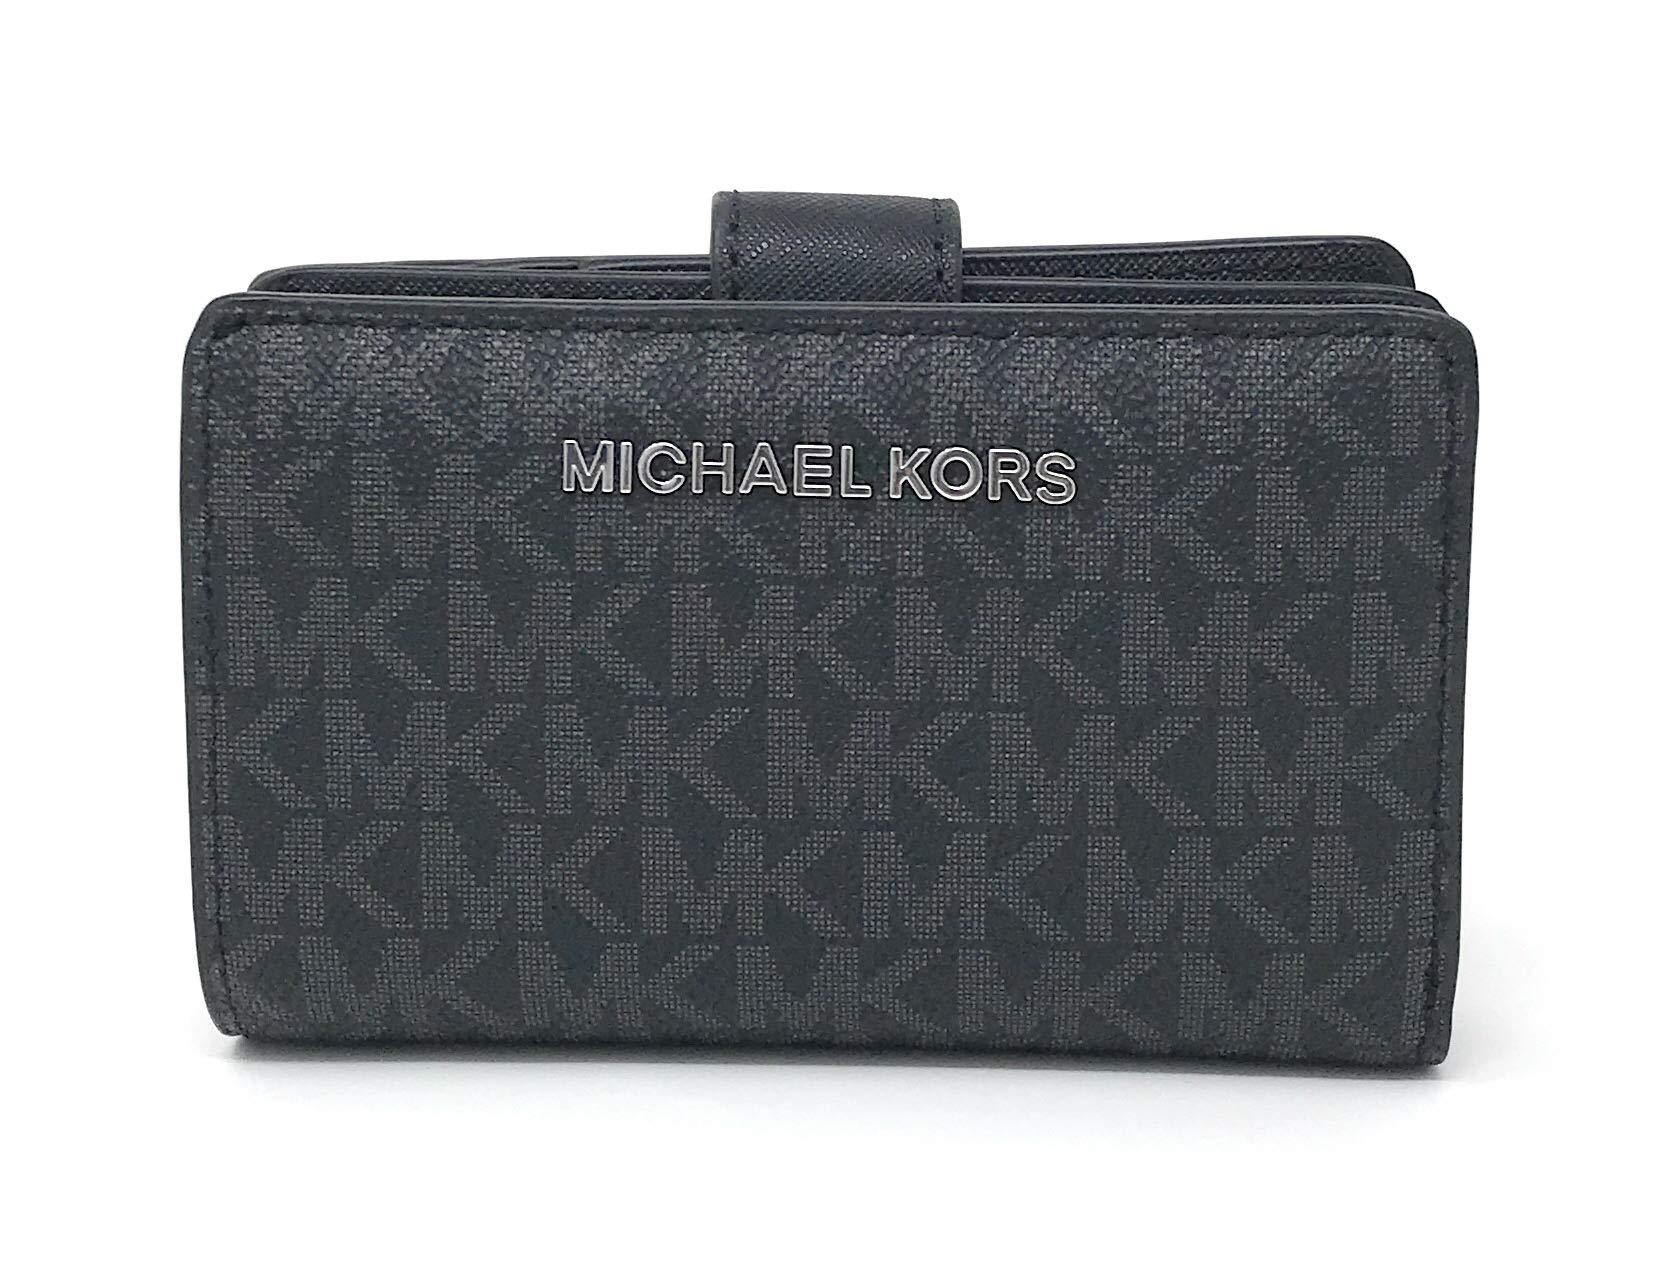 Michael Kors Jet Set Travel PVC Signature Bifold Zip Coin Wallet Clutch (Black PVC 2018)